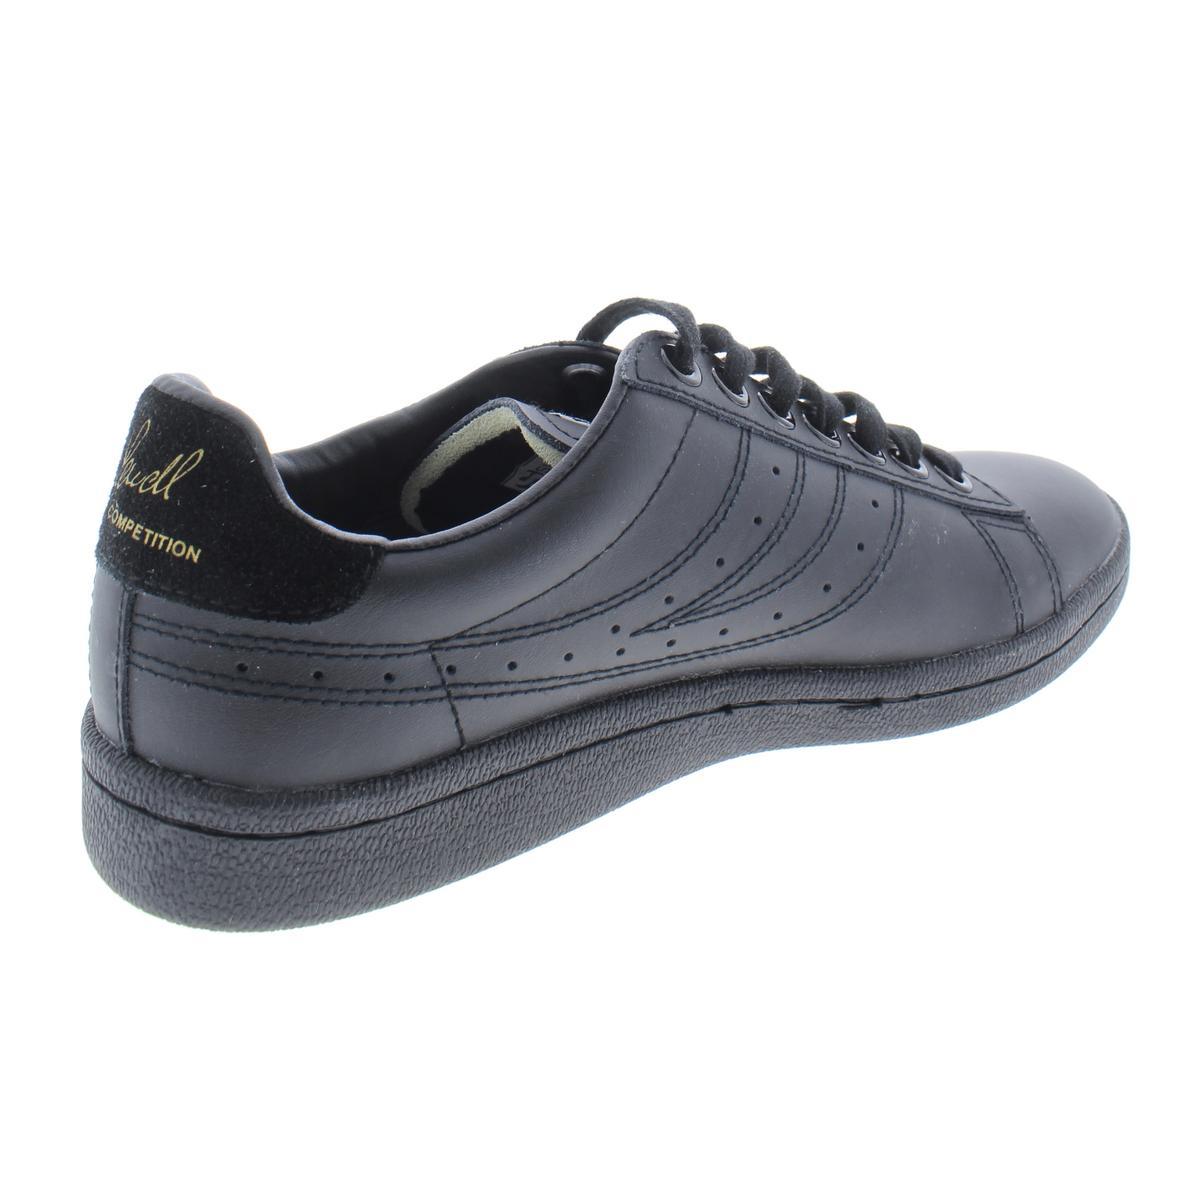 Superga-Mens-4832-Efglu-Leather-Trainer-Classic-Fashion-Sneakers-Shoes-BHFO-7965 thumbnail 4